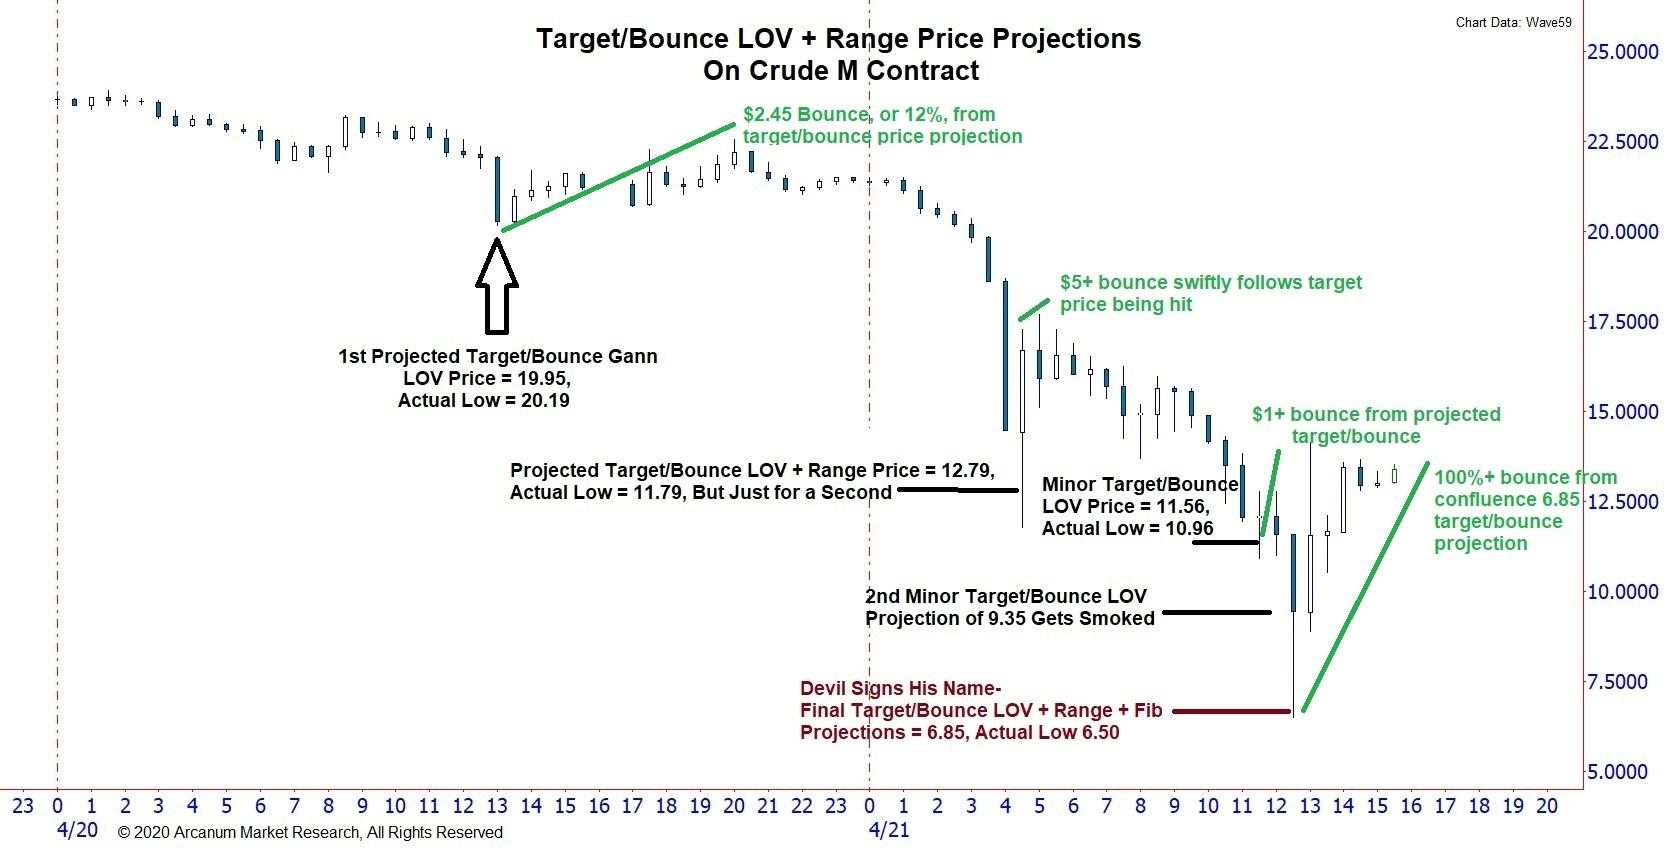 Crude M Contract Downrange Targets Hit